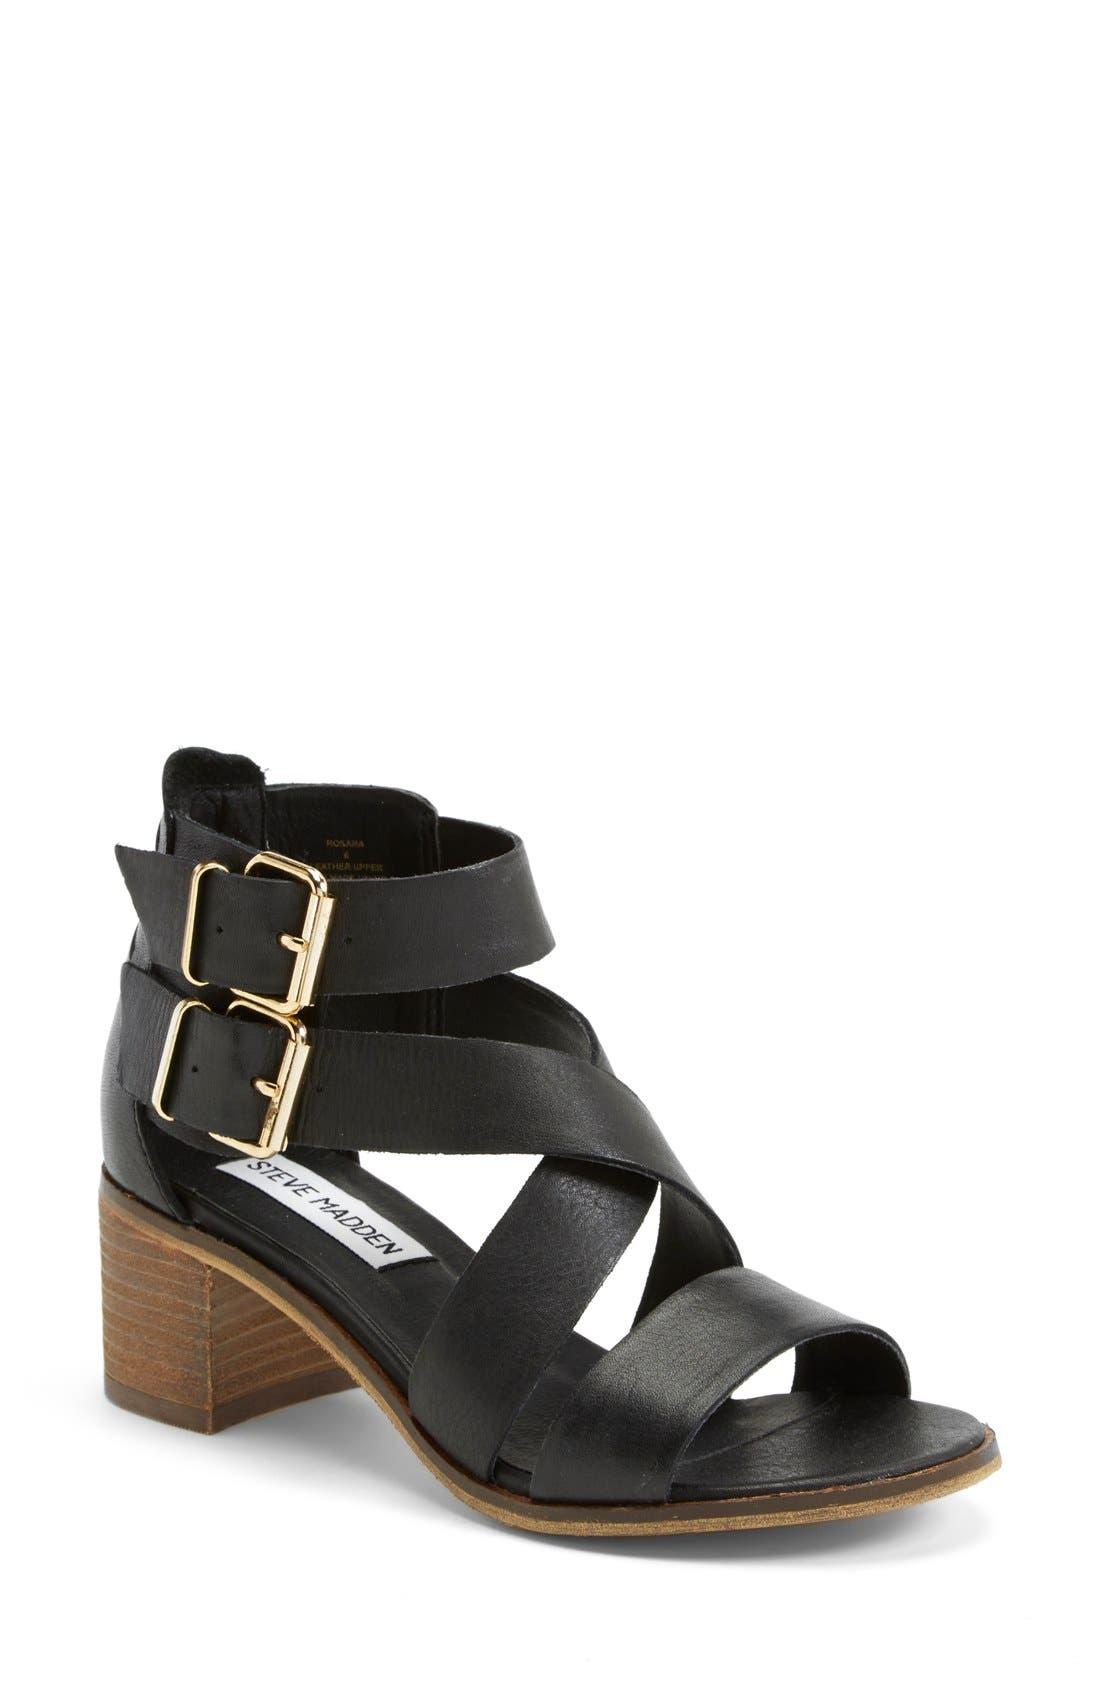 'Rosana' Double Ankle Strap Leather Sandal,                         Main,                         color, 001